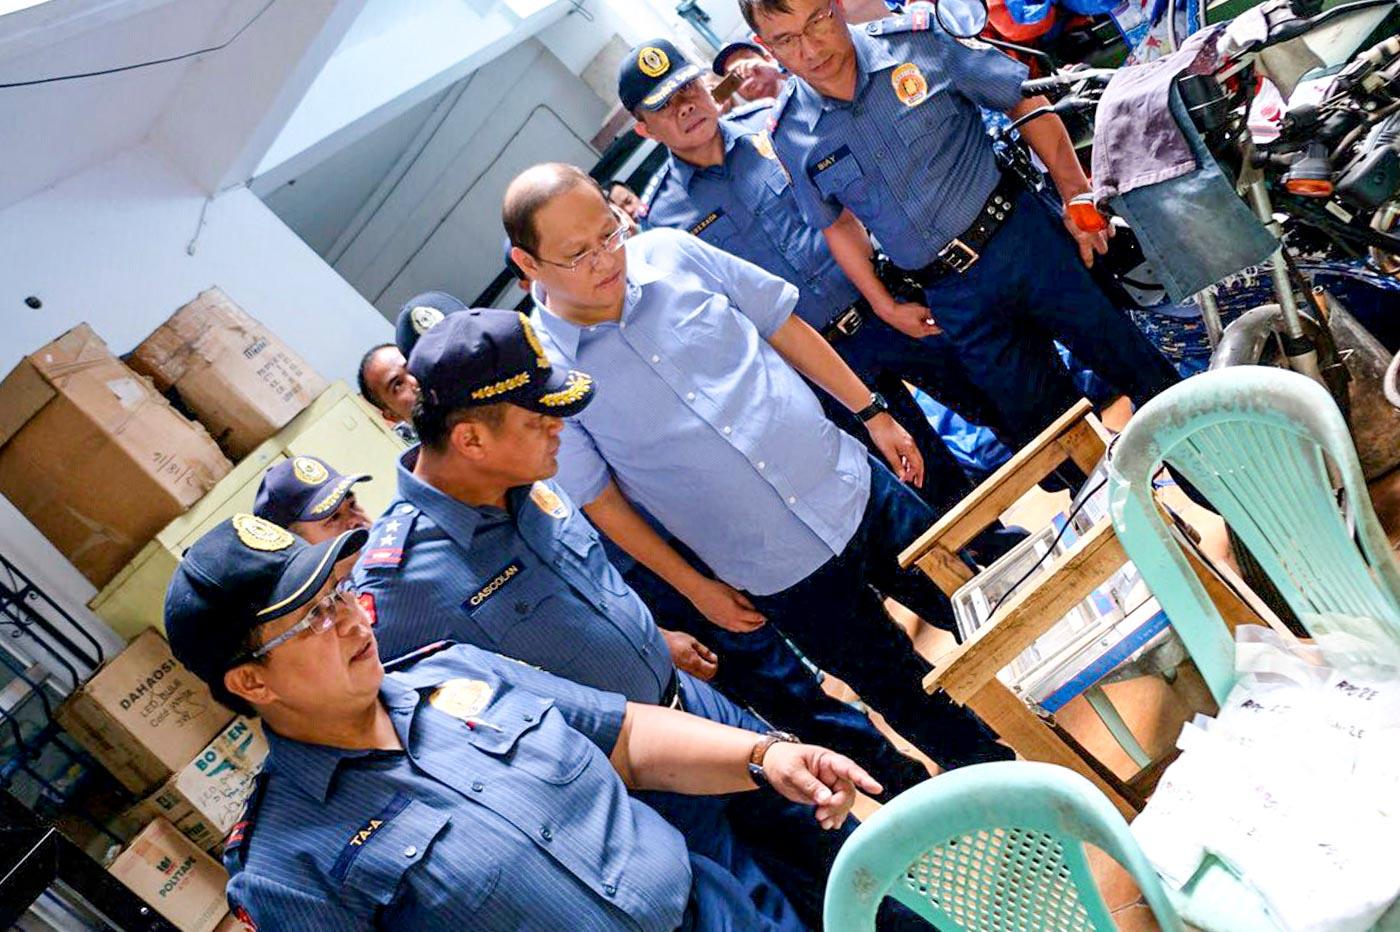 SHABU LAB. Authorities check some items found inside the shabu laboratory in a subdivision in Barangay Nangka, Marikina. Photo courtesy of NCRPO